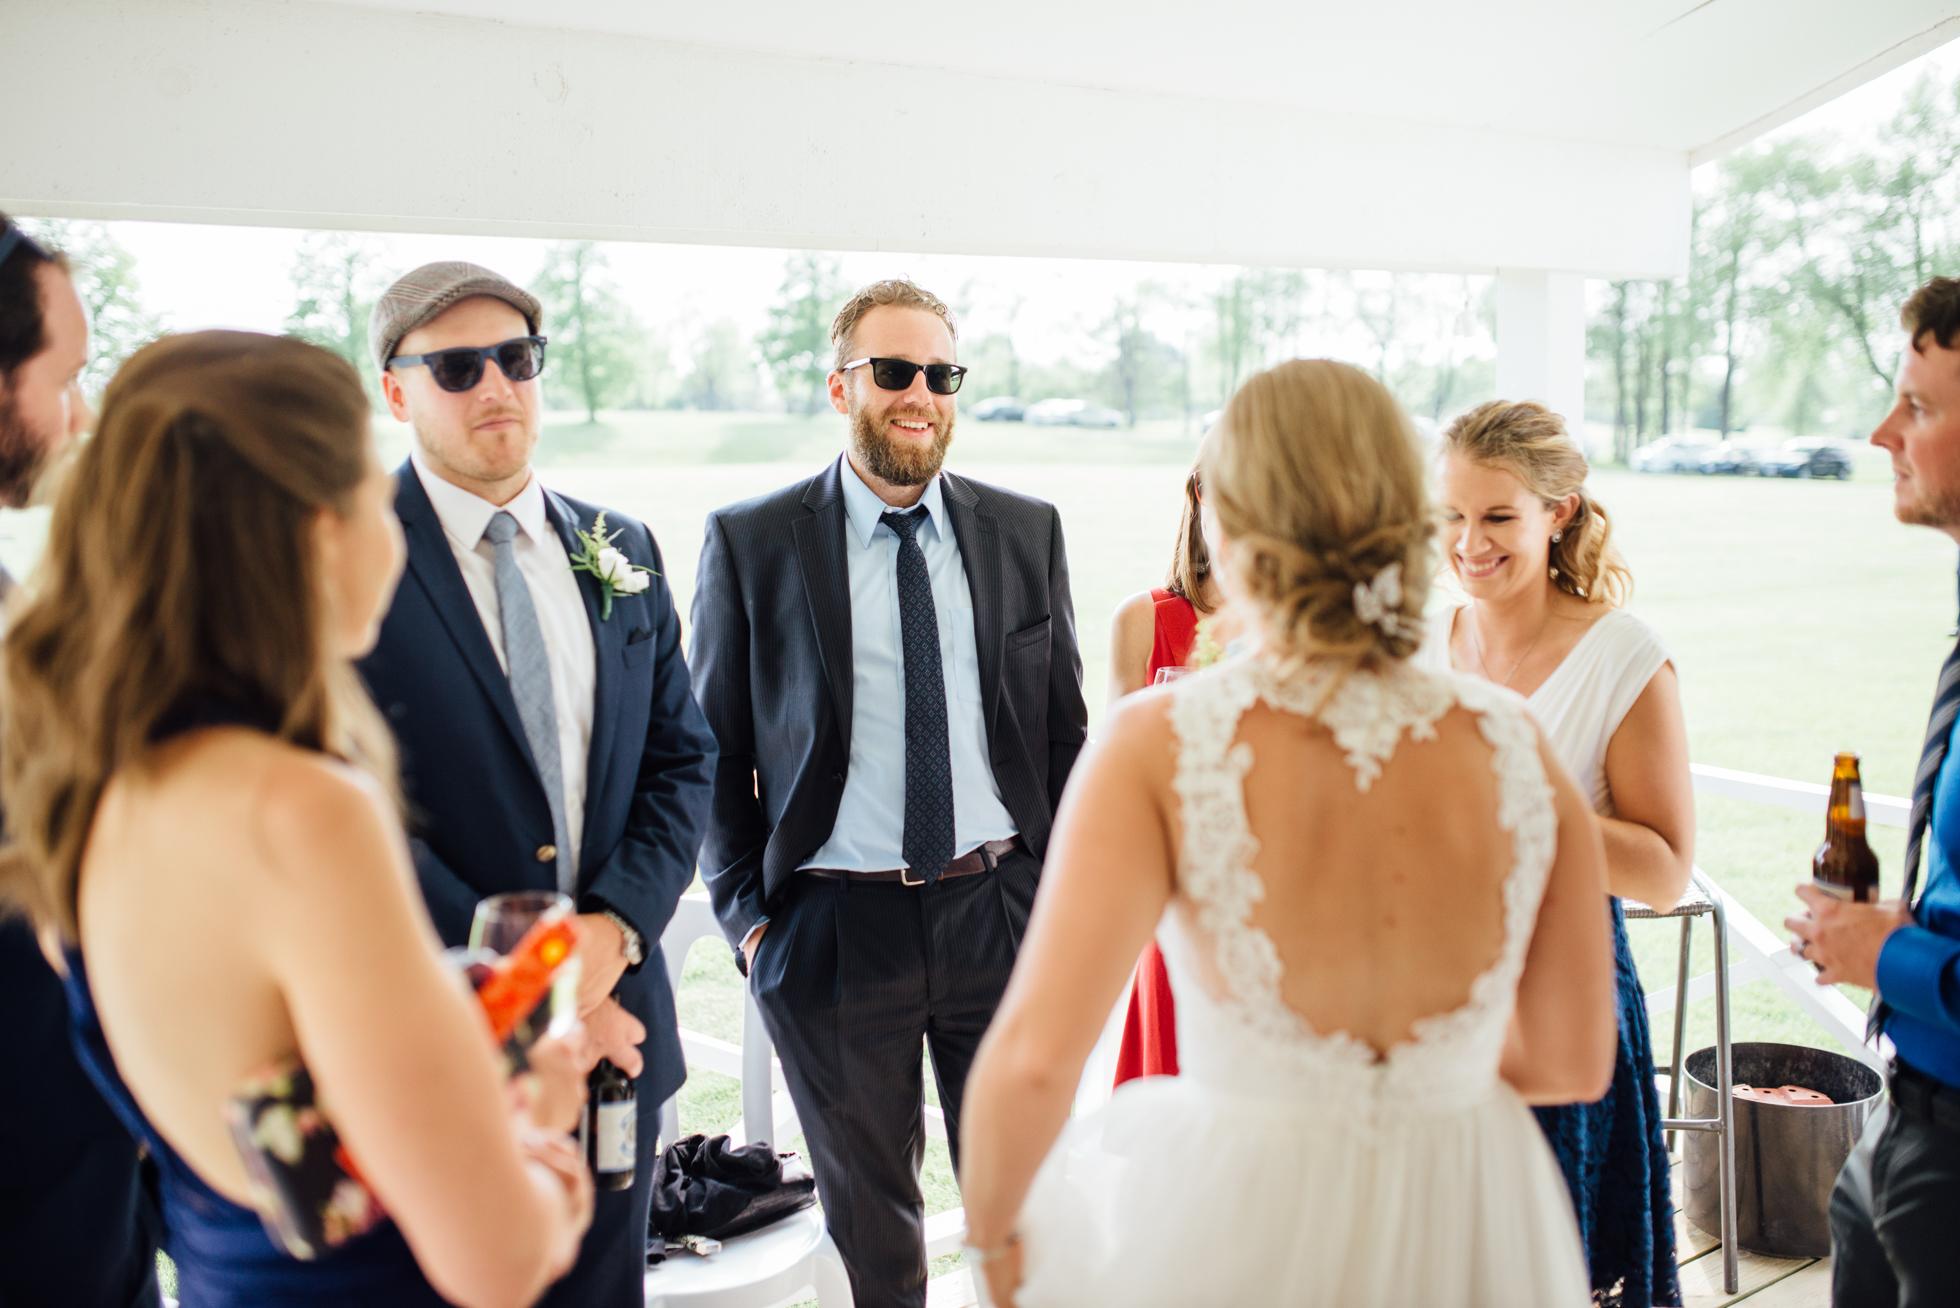 Outdoor-Caledon-Tralee-Wedding-Photography-77